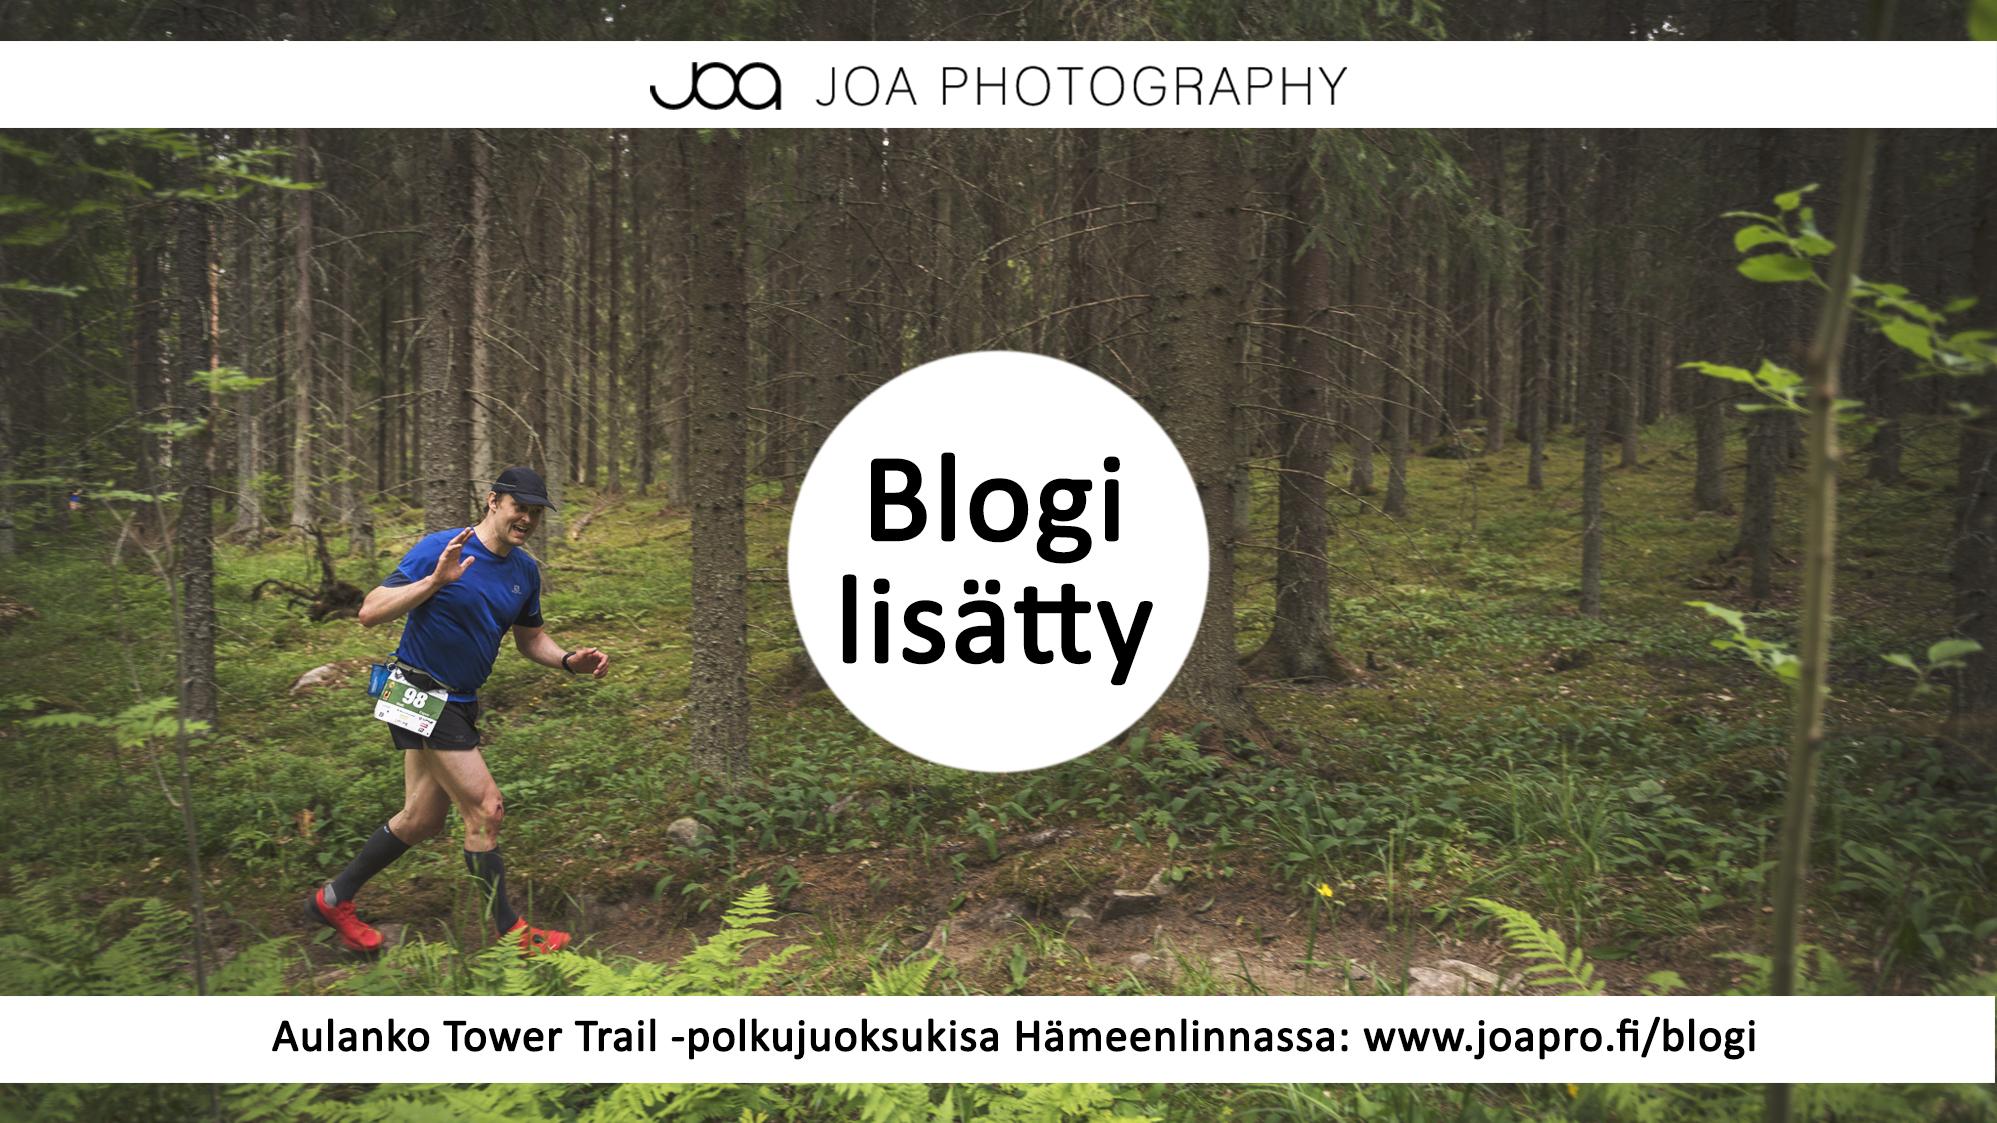 JOA Photography-AulankoTowerTrail-blogi.jpg